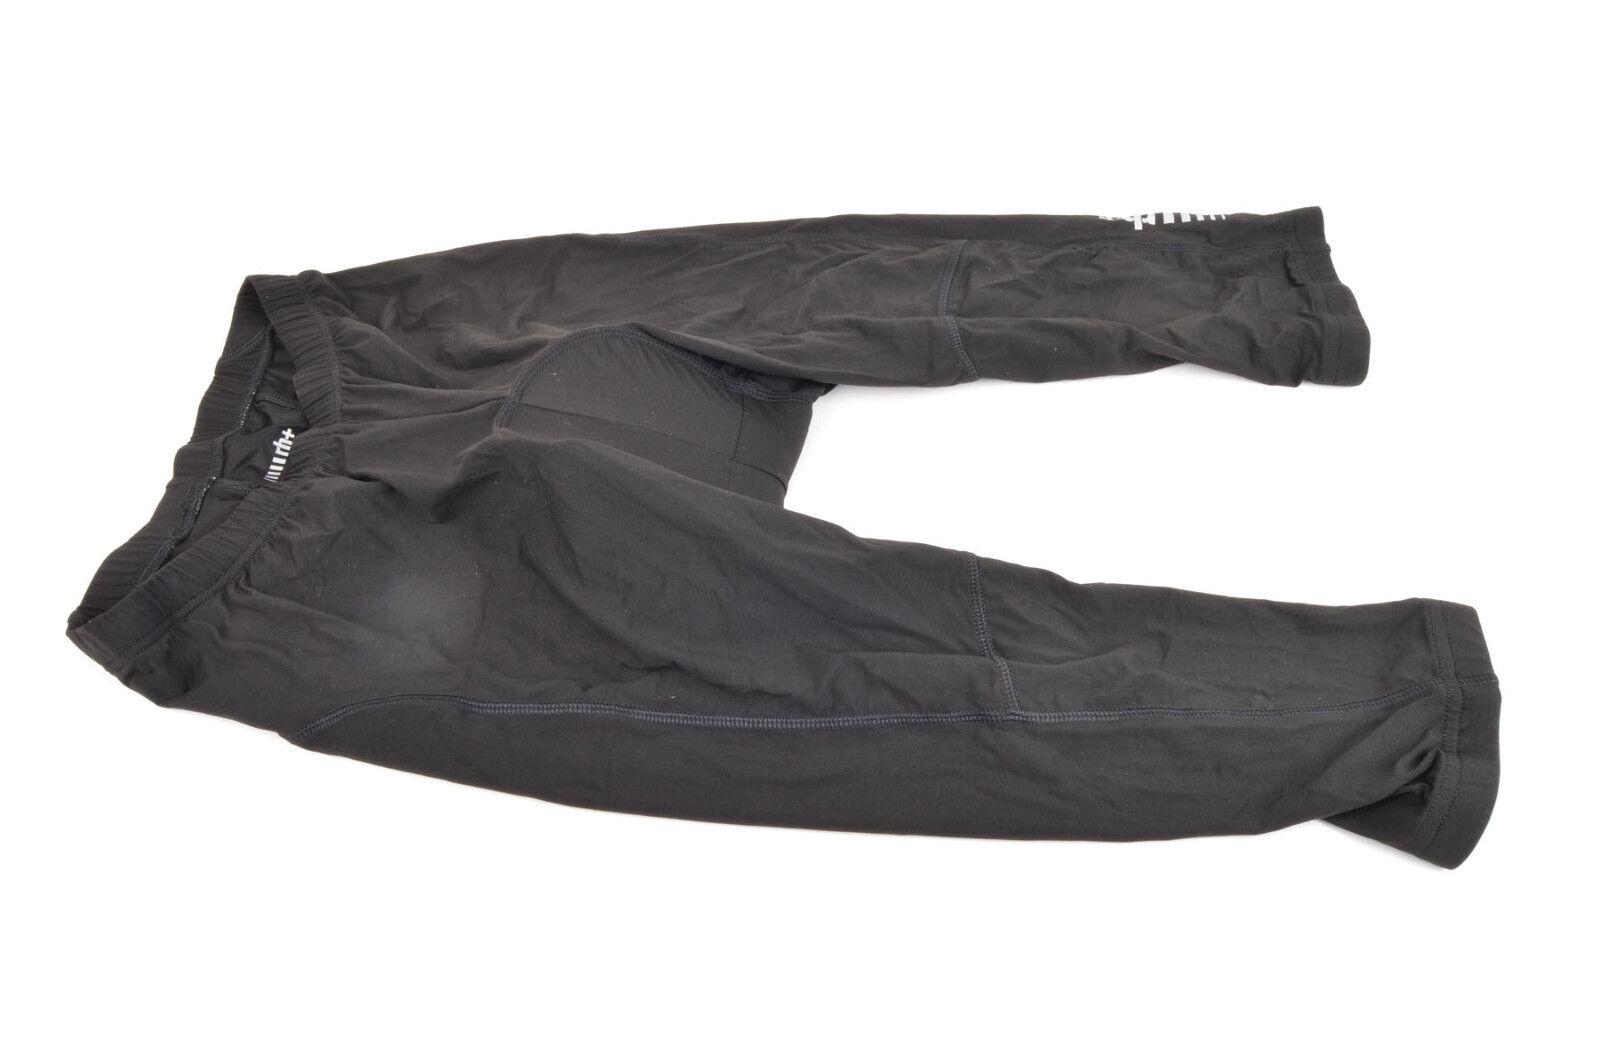 NEW Zero Rh+ black Logo MD Padded Pants in Size S